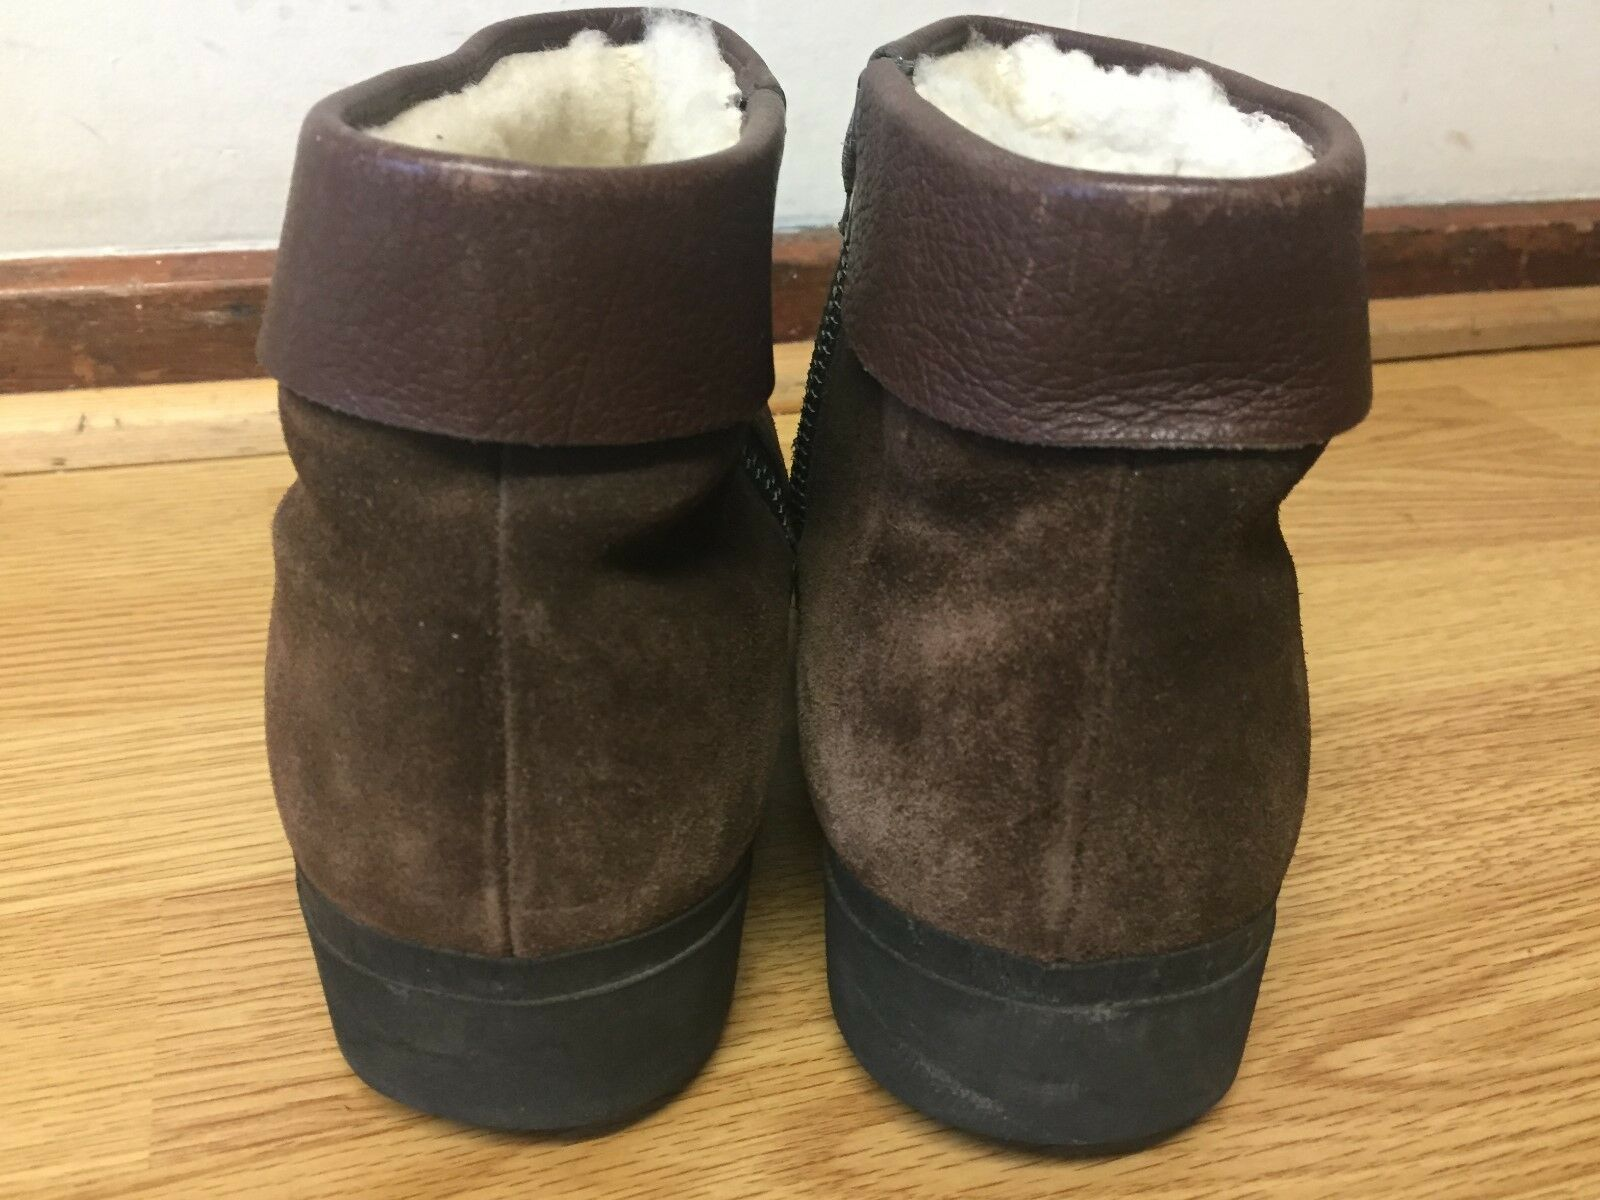 K schuhe winter skips Damenss fur / Stiefel Größe uk 8 / fur eu 42 57716f